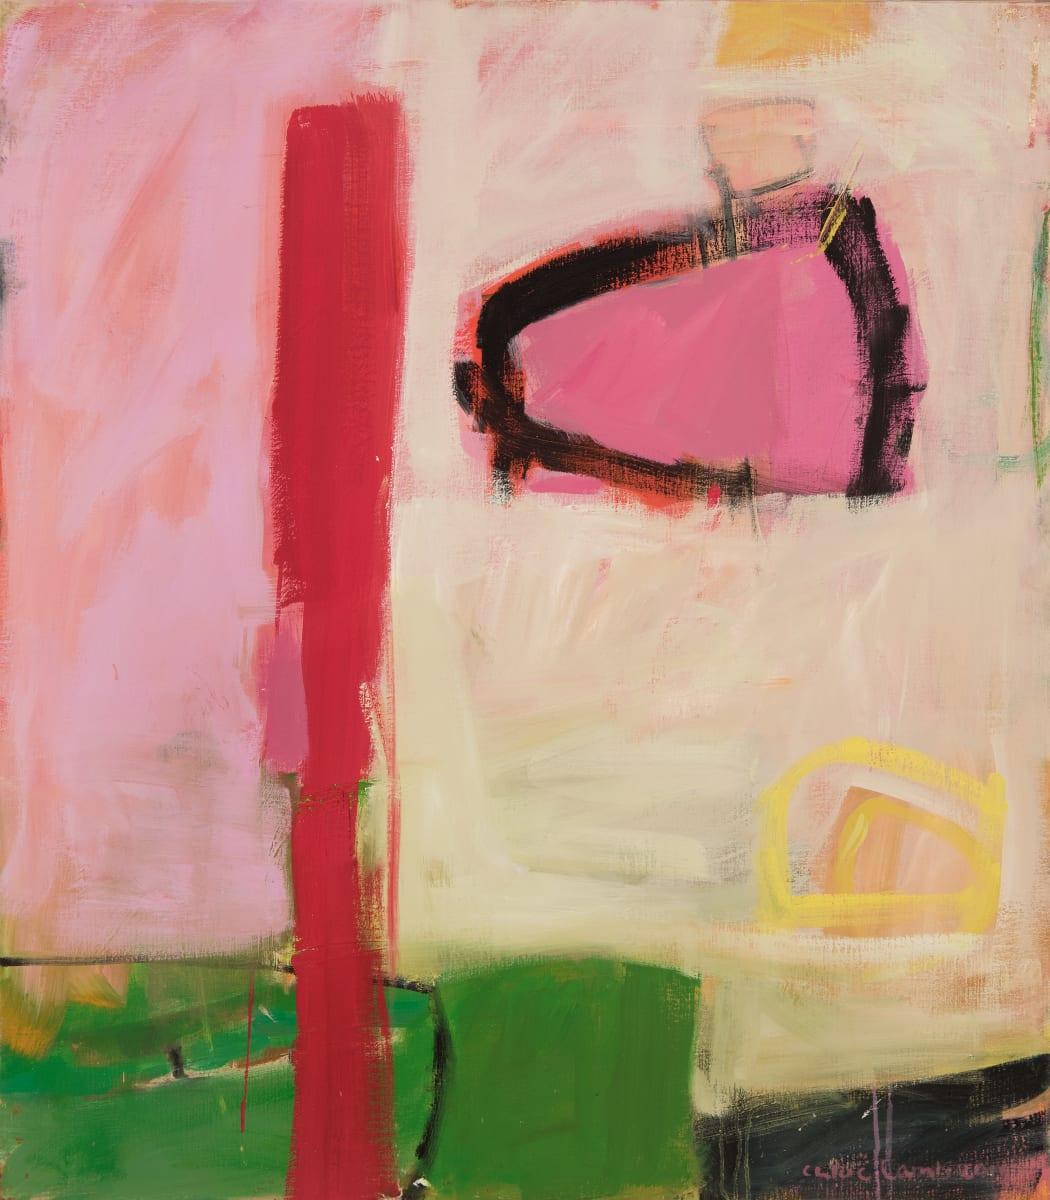 Color Harmonies: New Paintings by Chloë Lamb